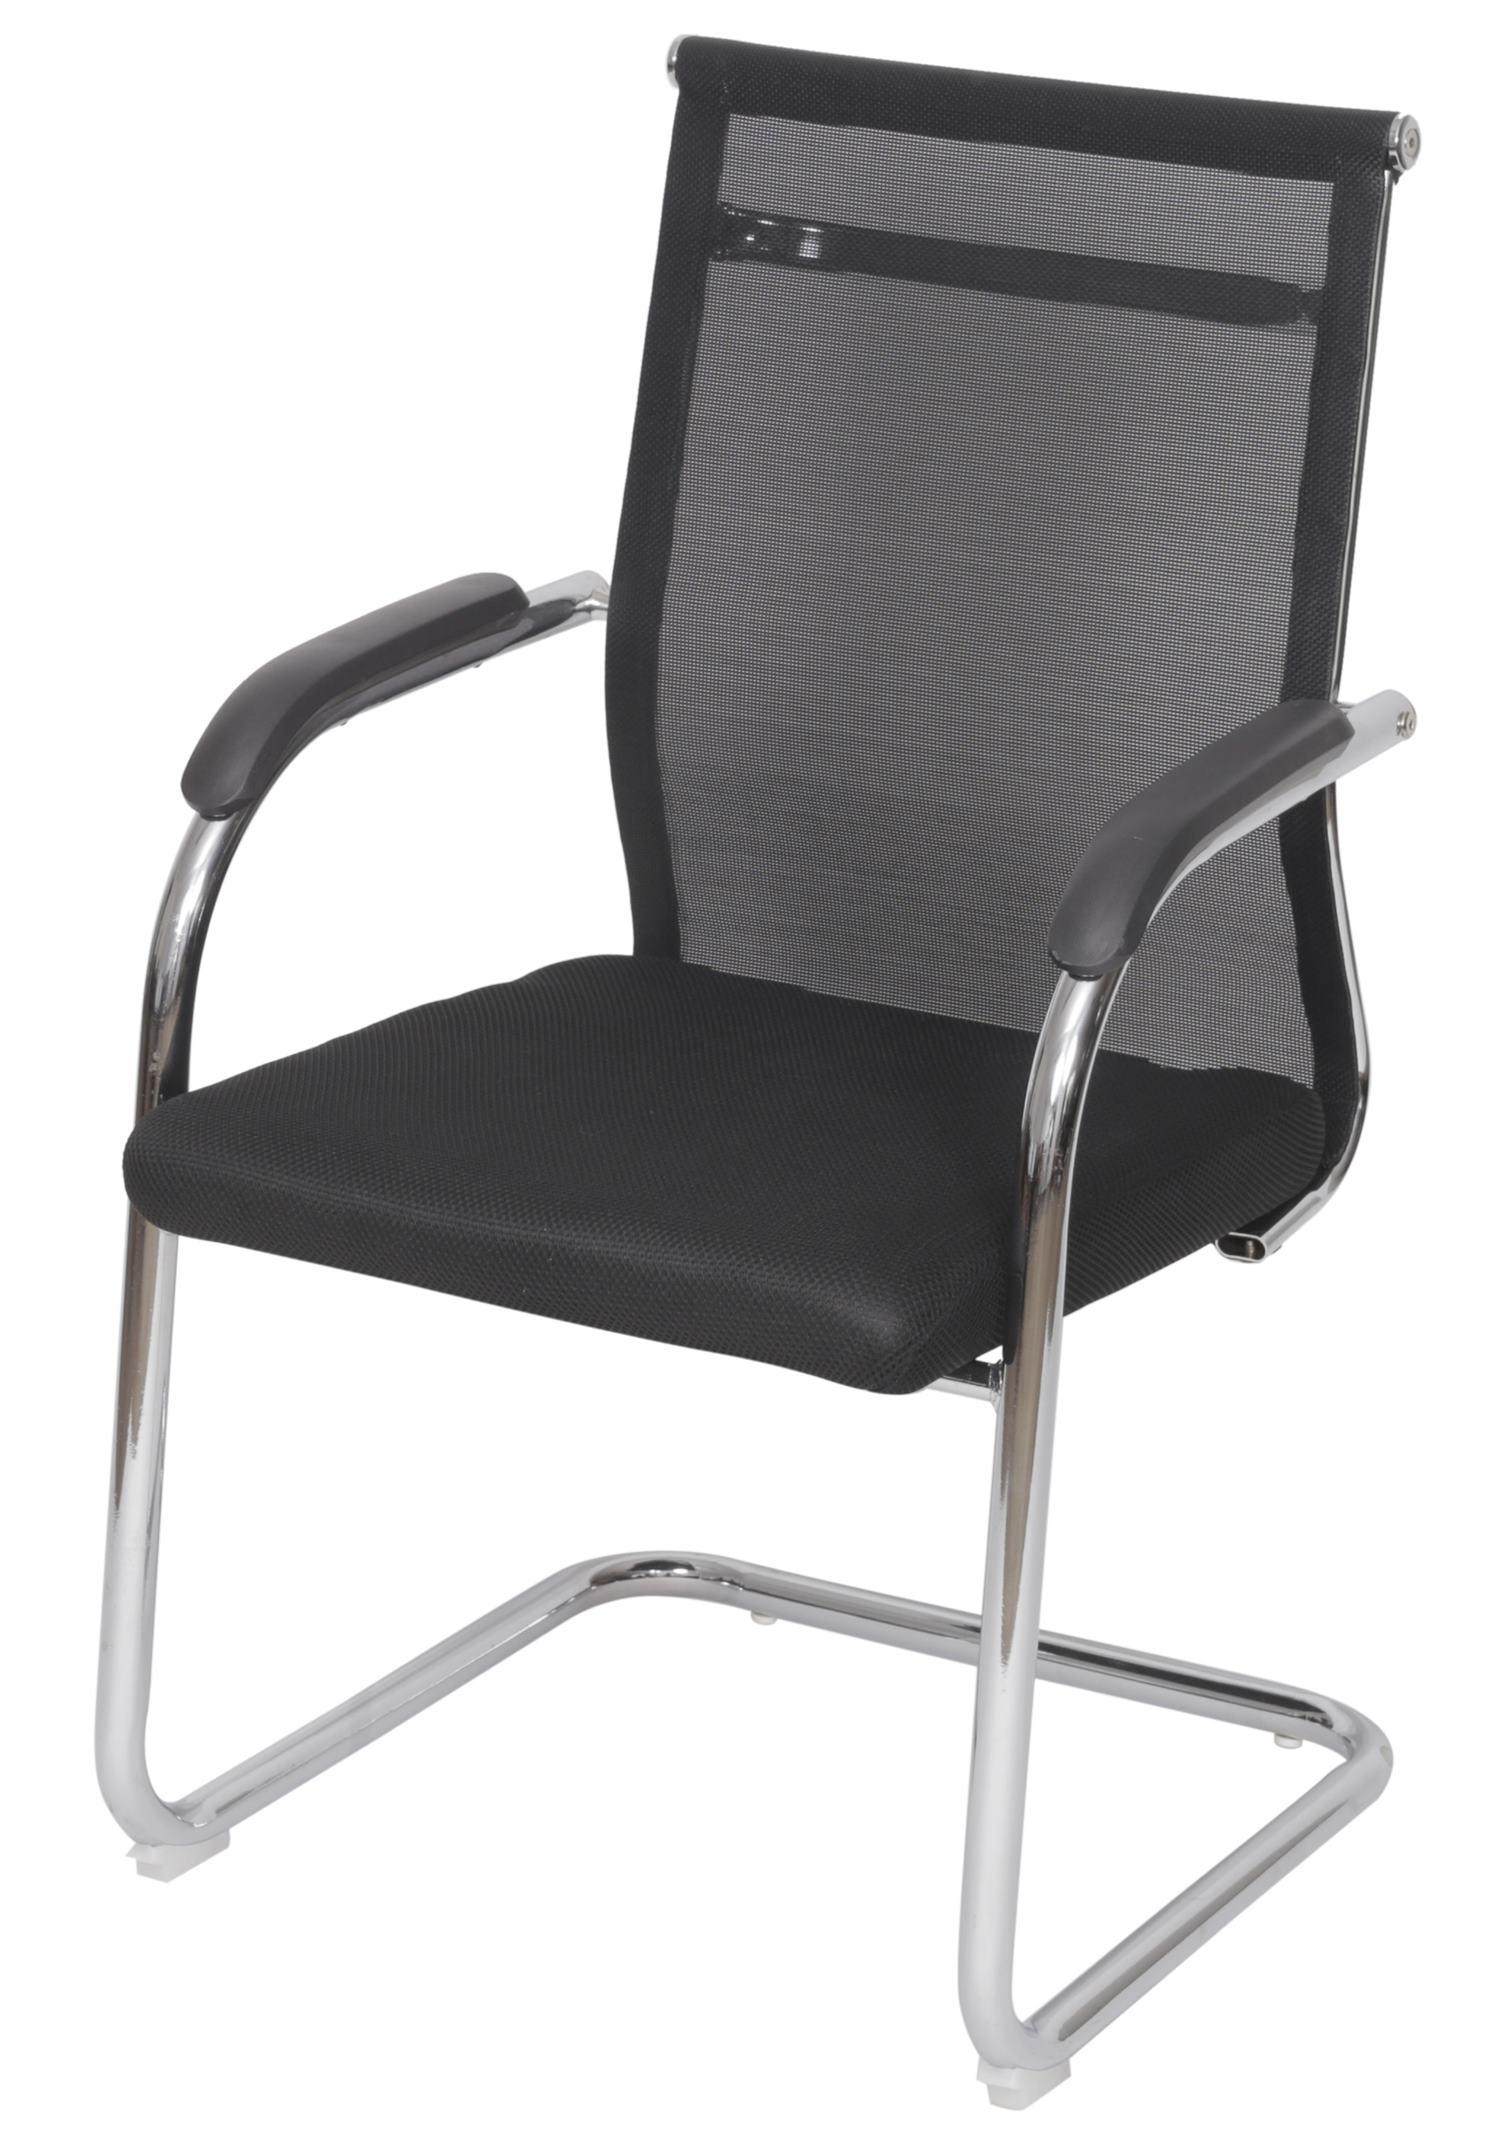 Cadeira Escritorio Basic Fixa Tela Preta com Base Cromada - 50034